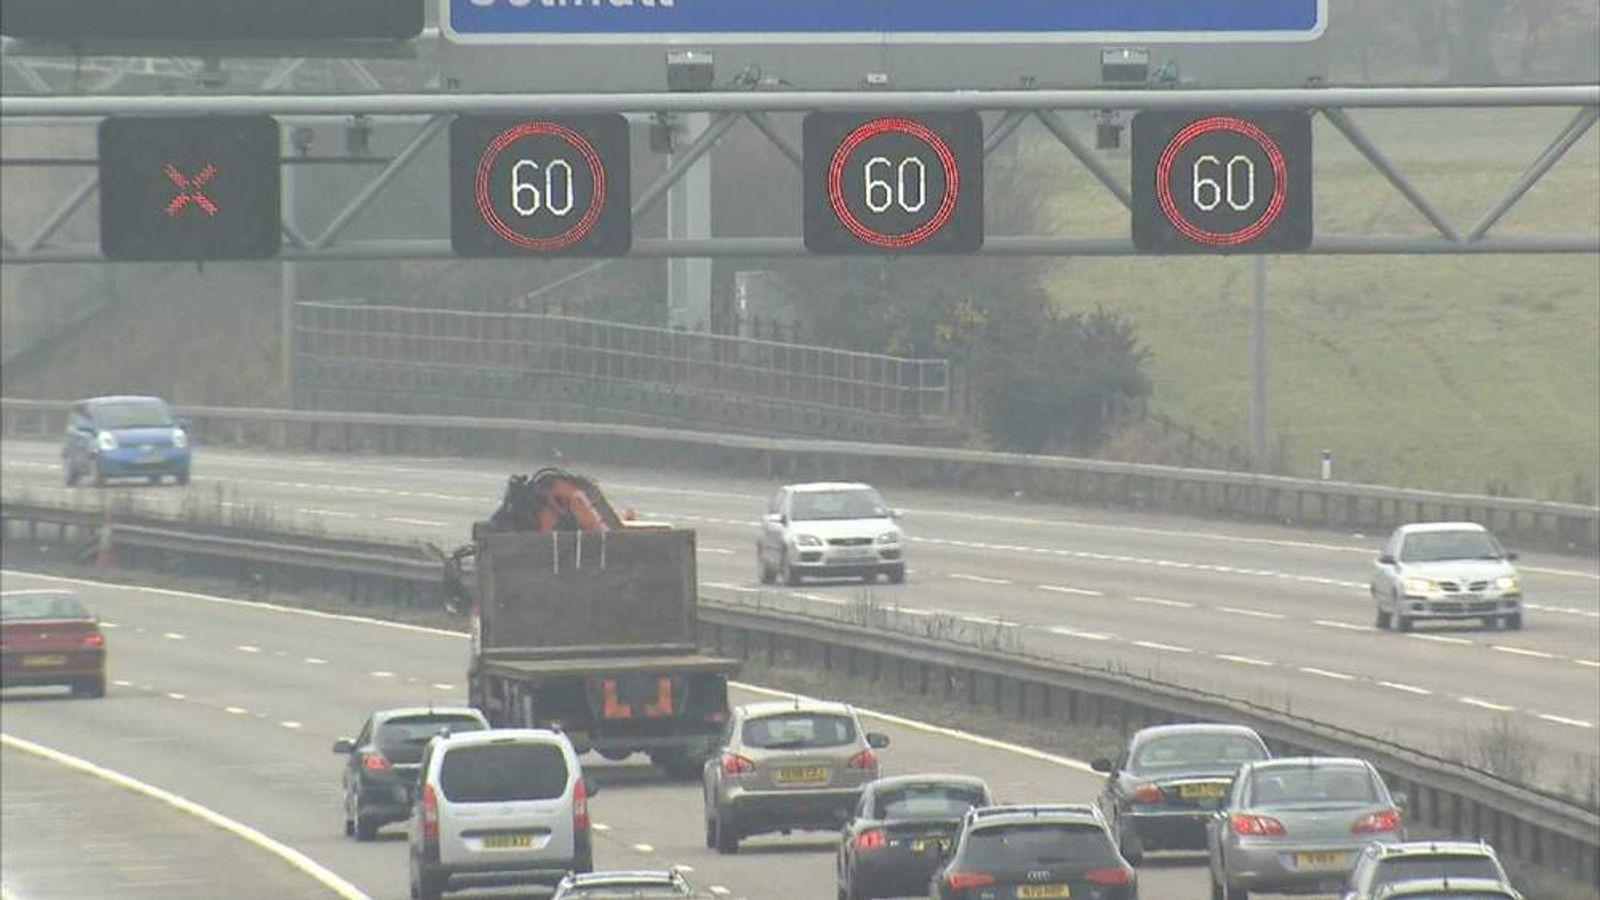 M42 Speed Signs